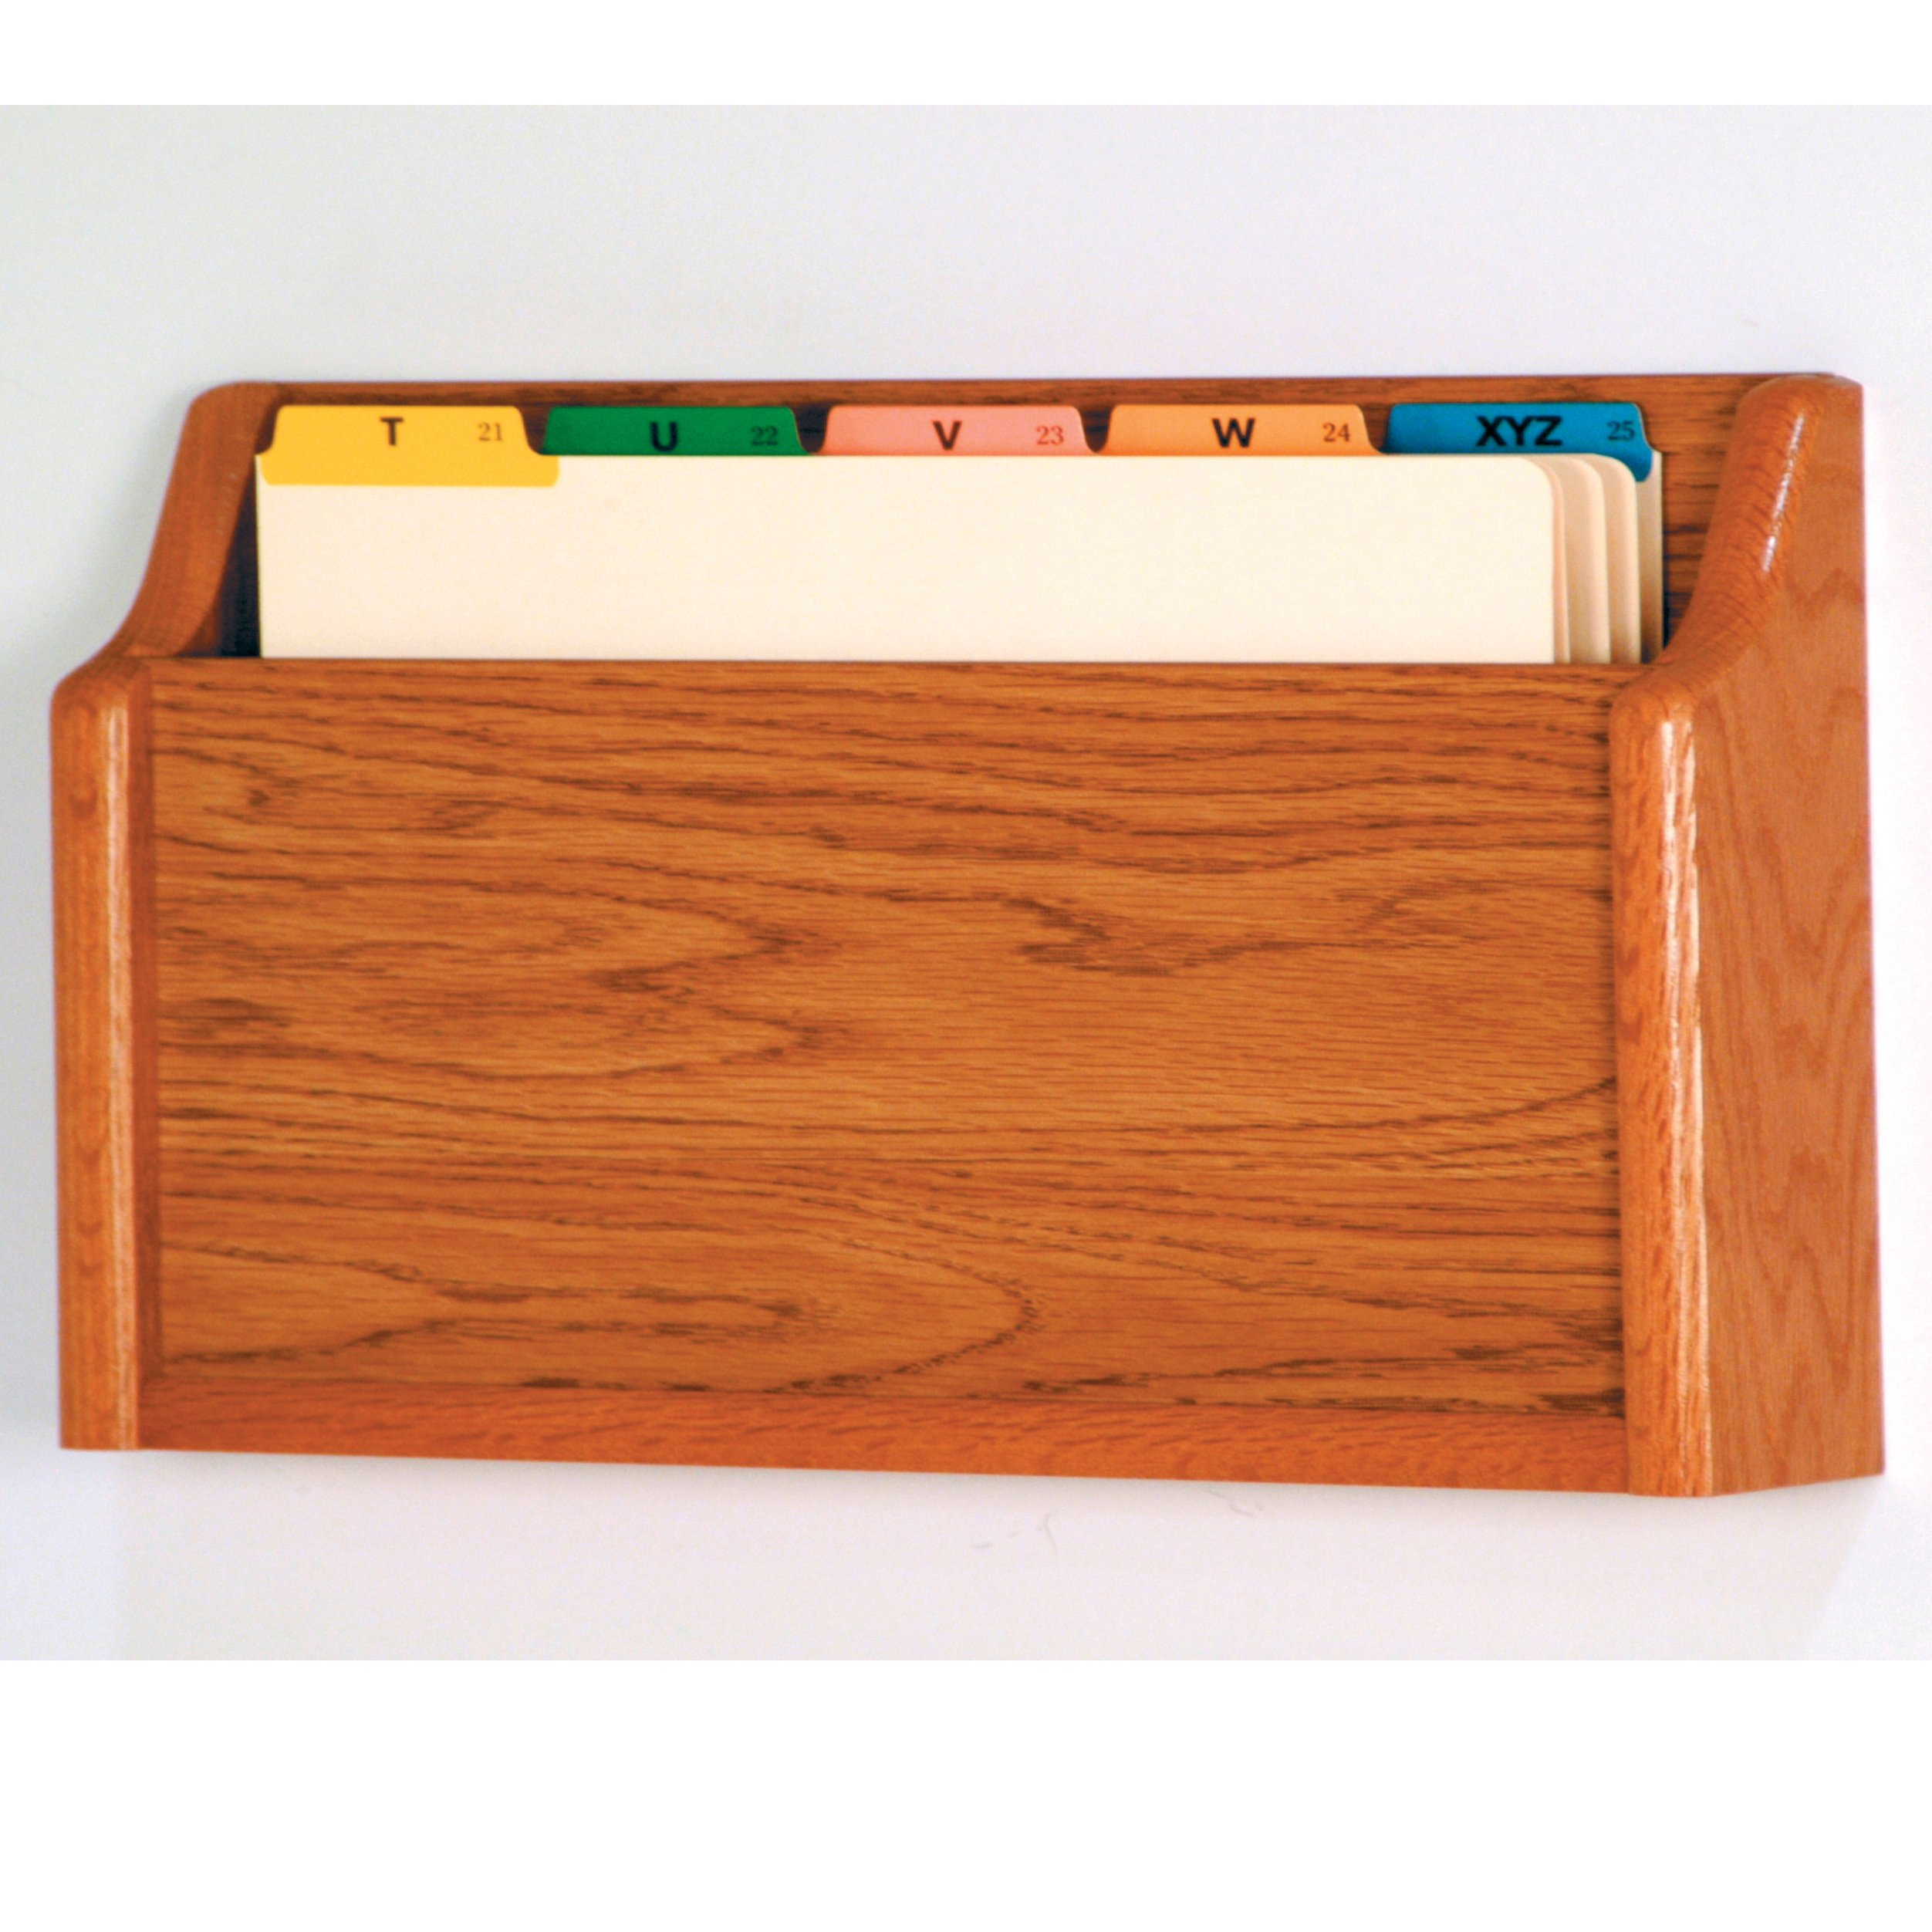 Wooden Mallet Square Bottom File Holder, Legal Size, Medium Oak